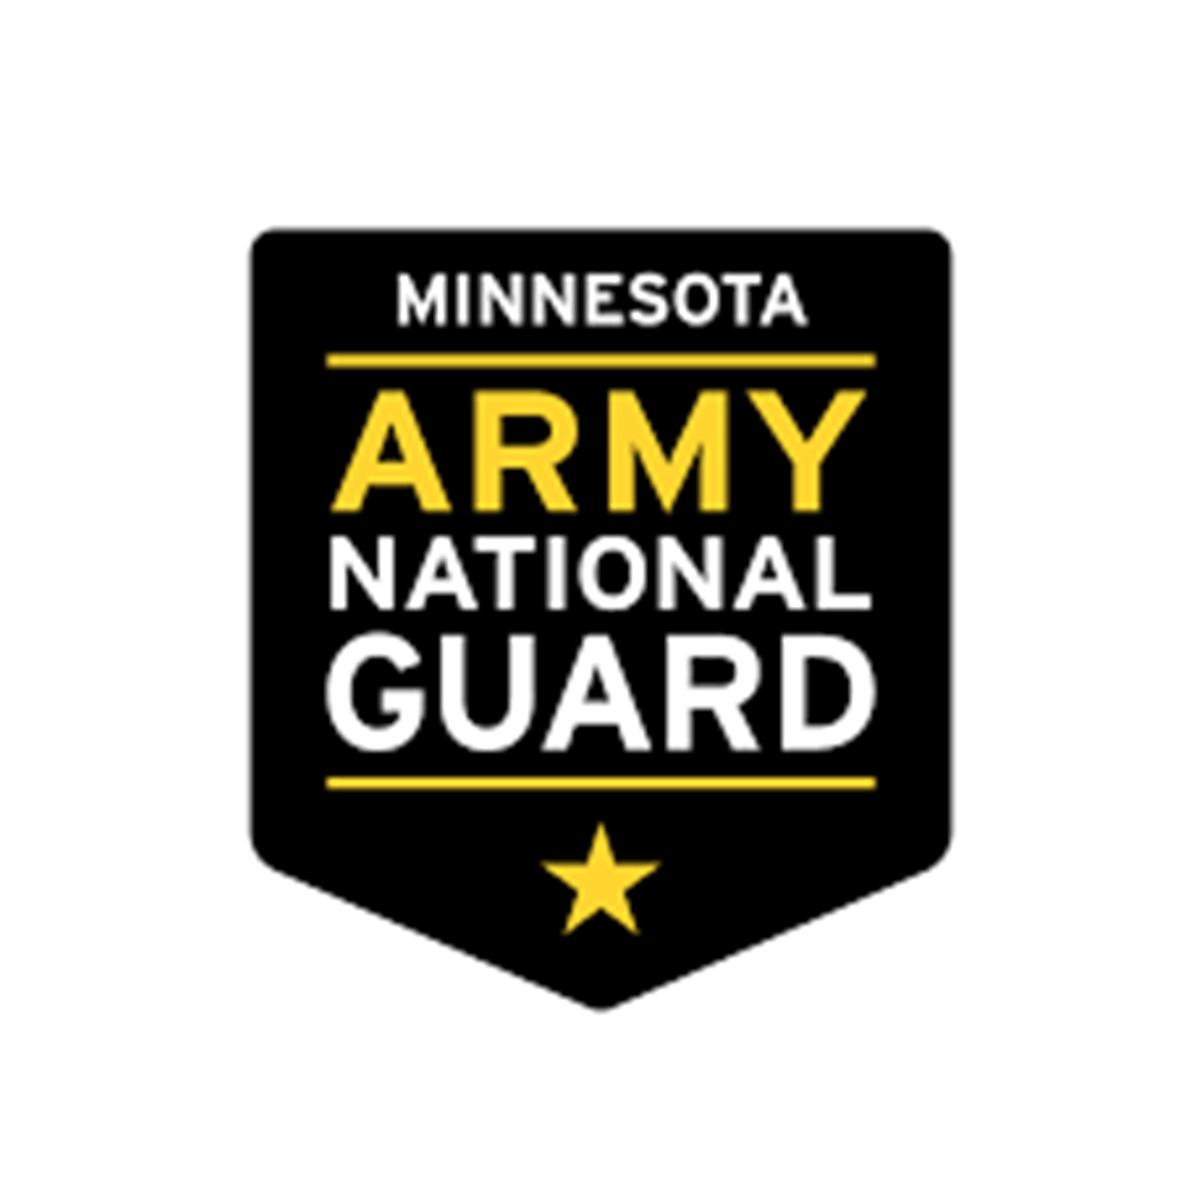 Minnesota Army National Guard